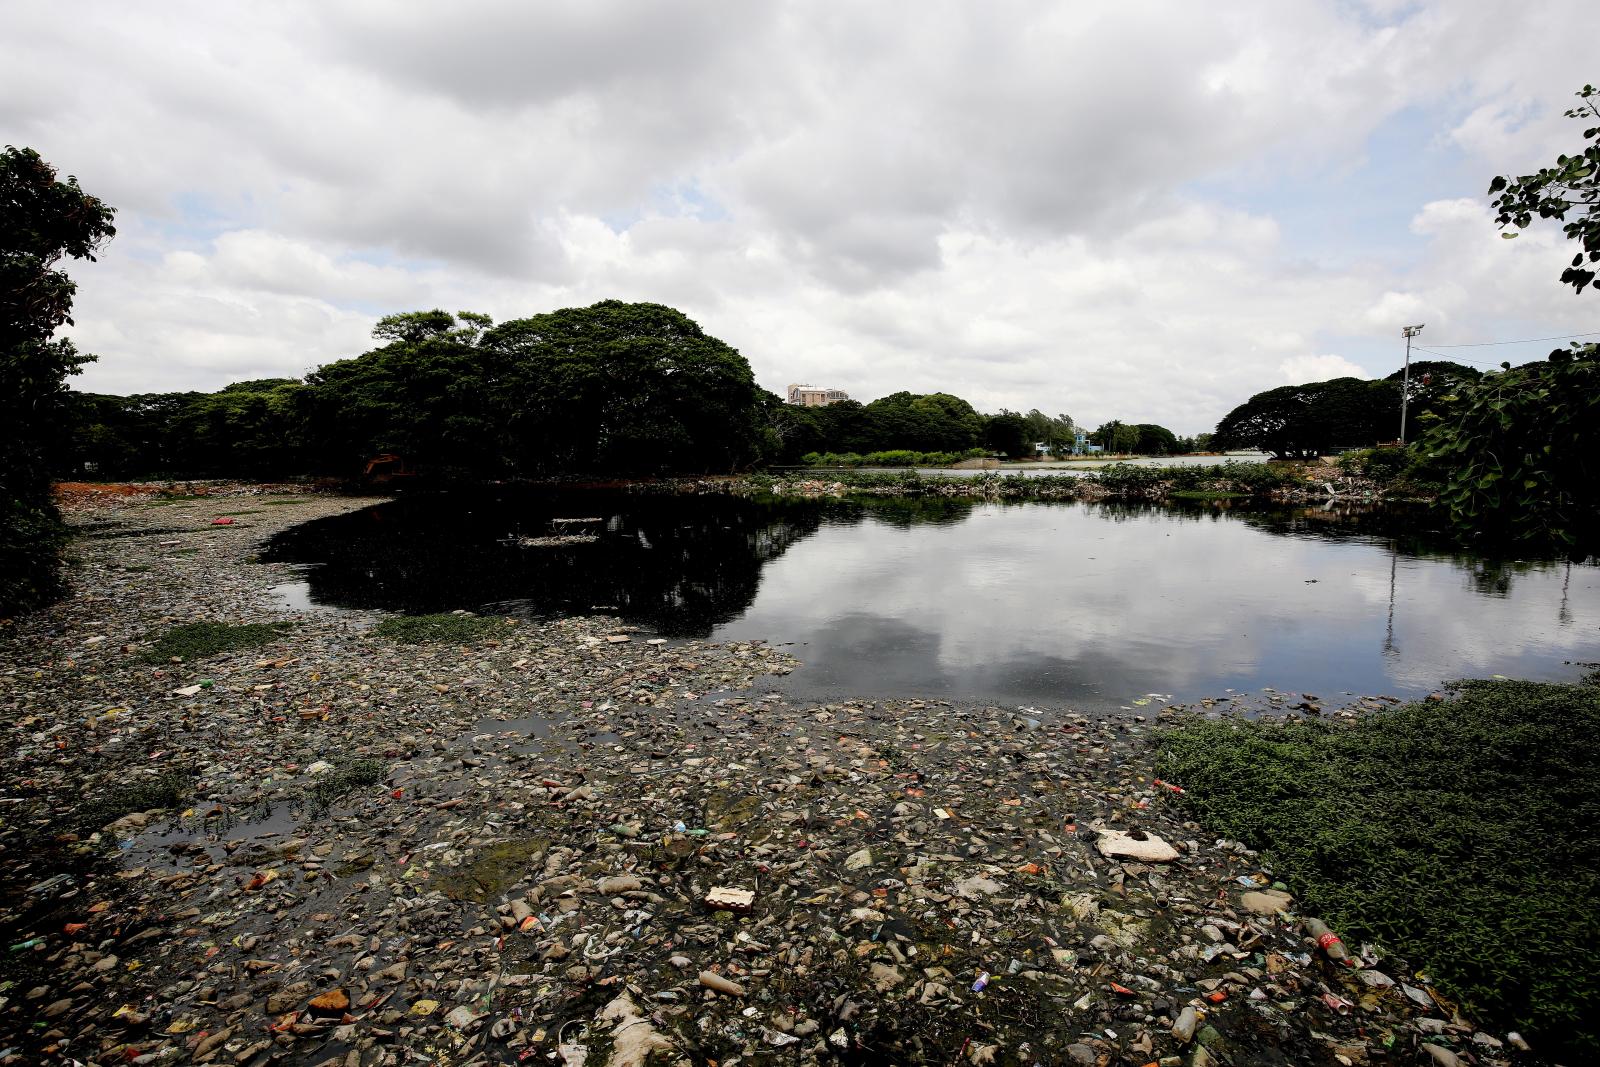 Śmieci w Indiach Fot. PAP/EPA/JAGADEESH NV